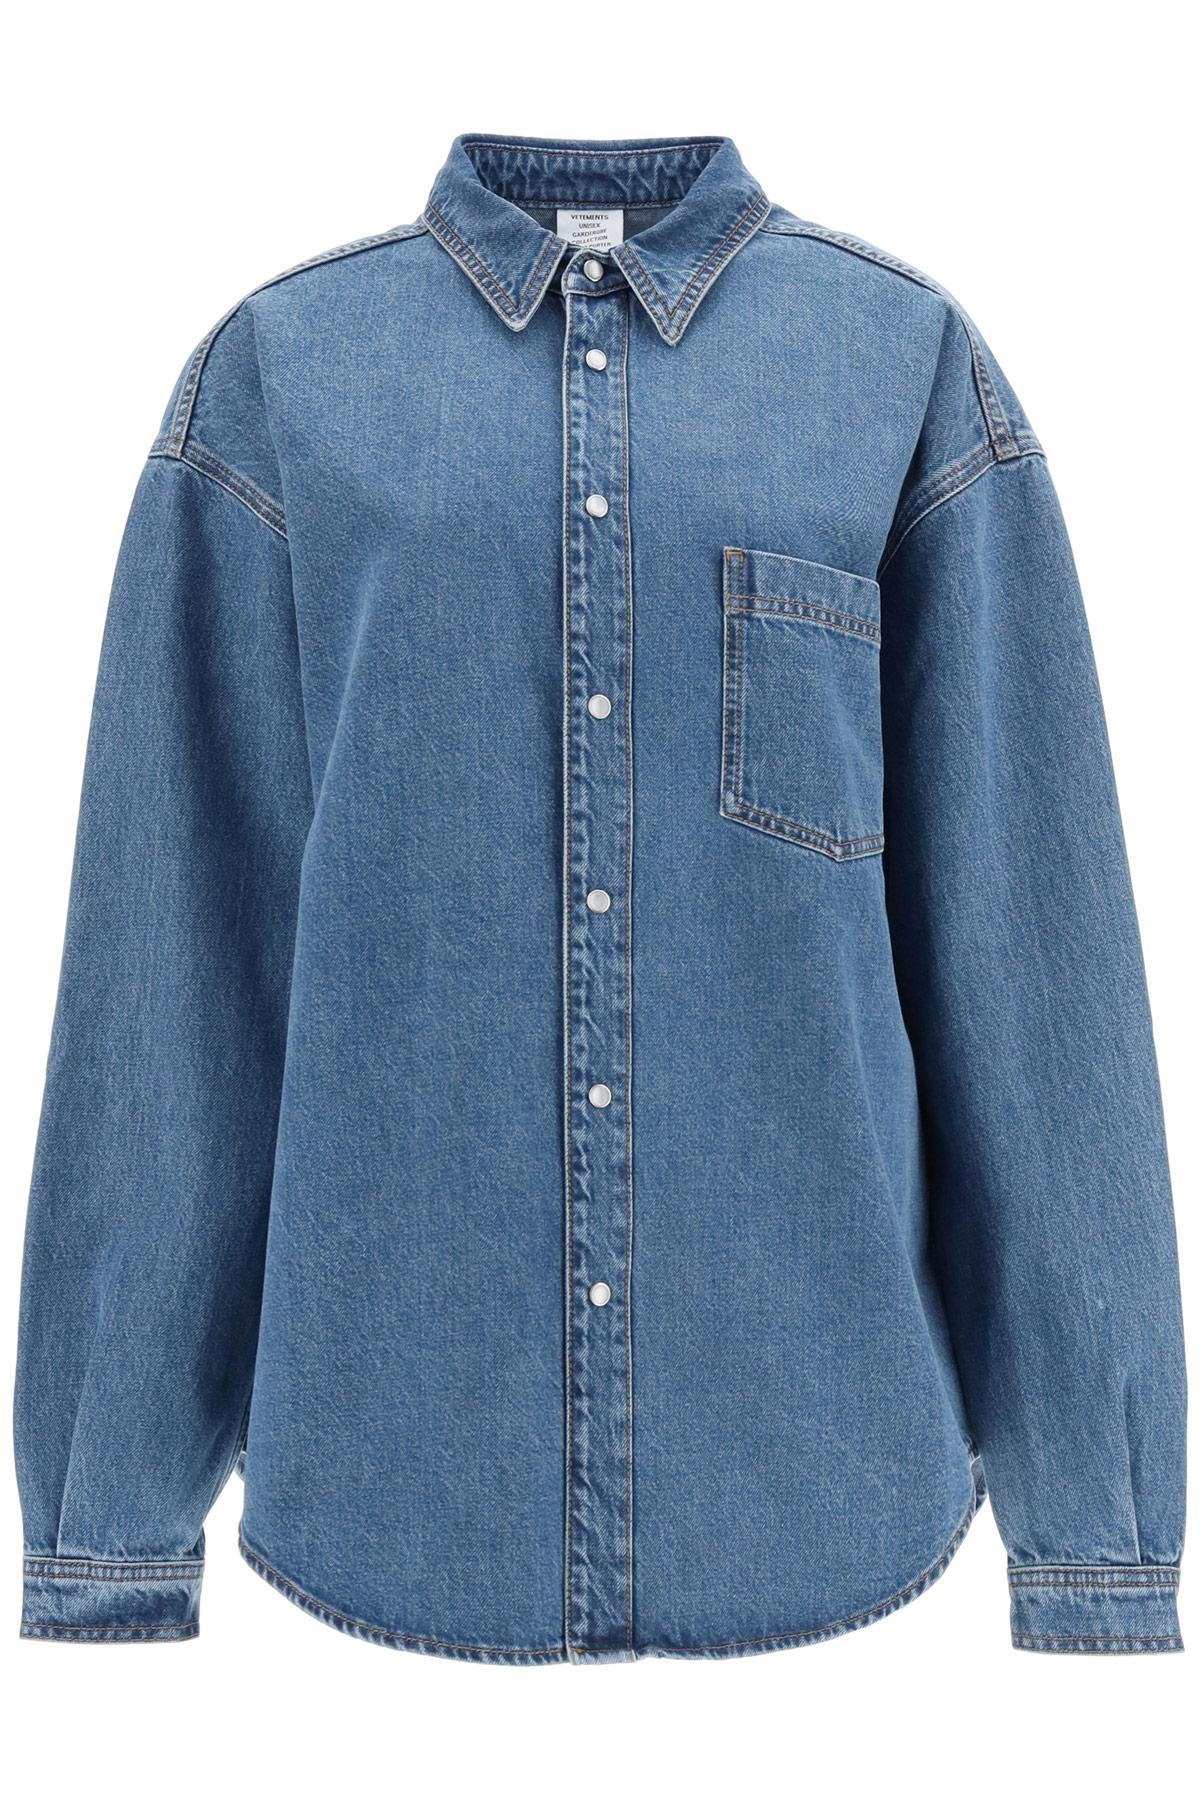 VETEMENTS DENIM SHIRT WITH ON BACK LOGO S Blue Cotton, Denim